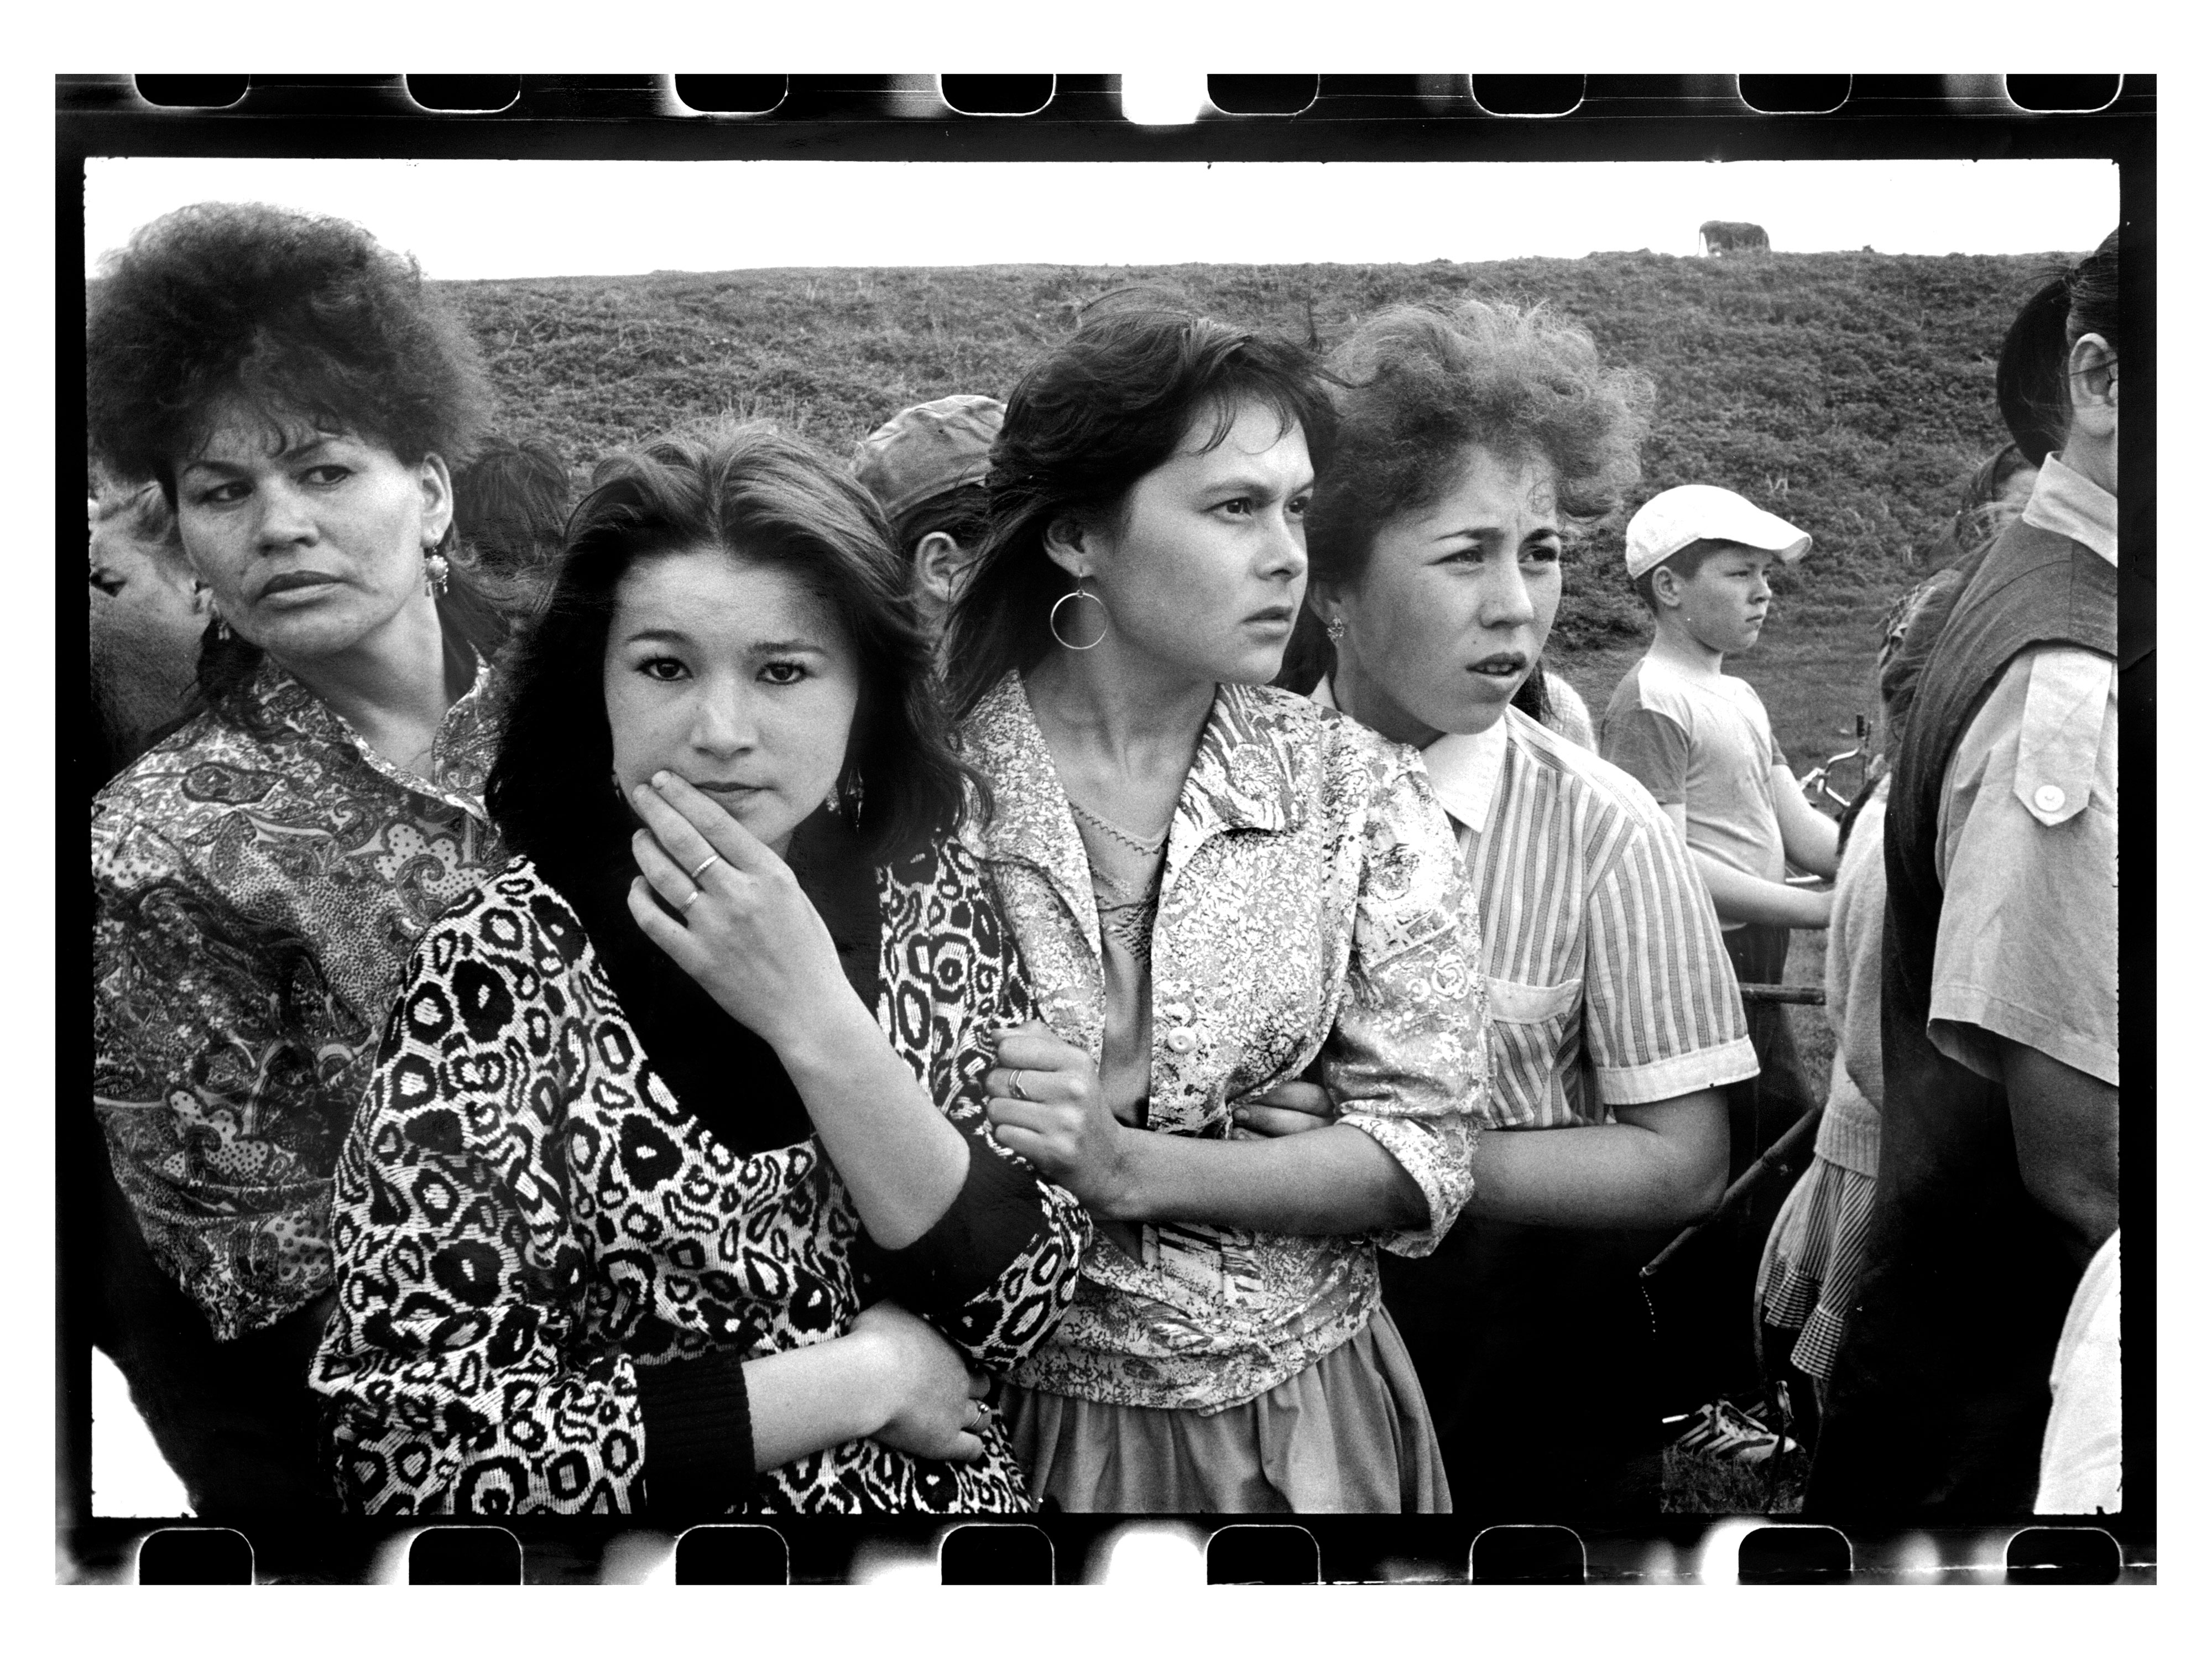 Maids of Muslyumovo, Chelyabinsk, Russia